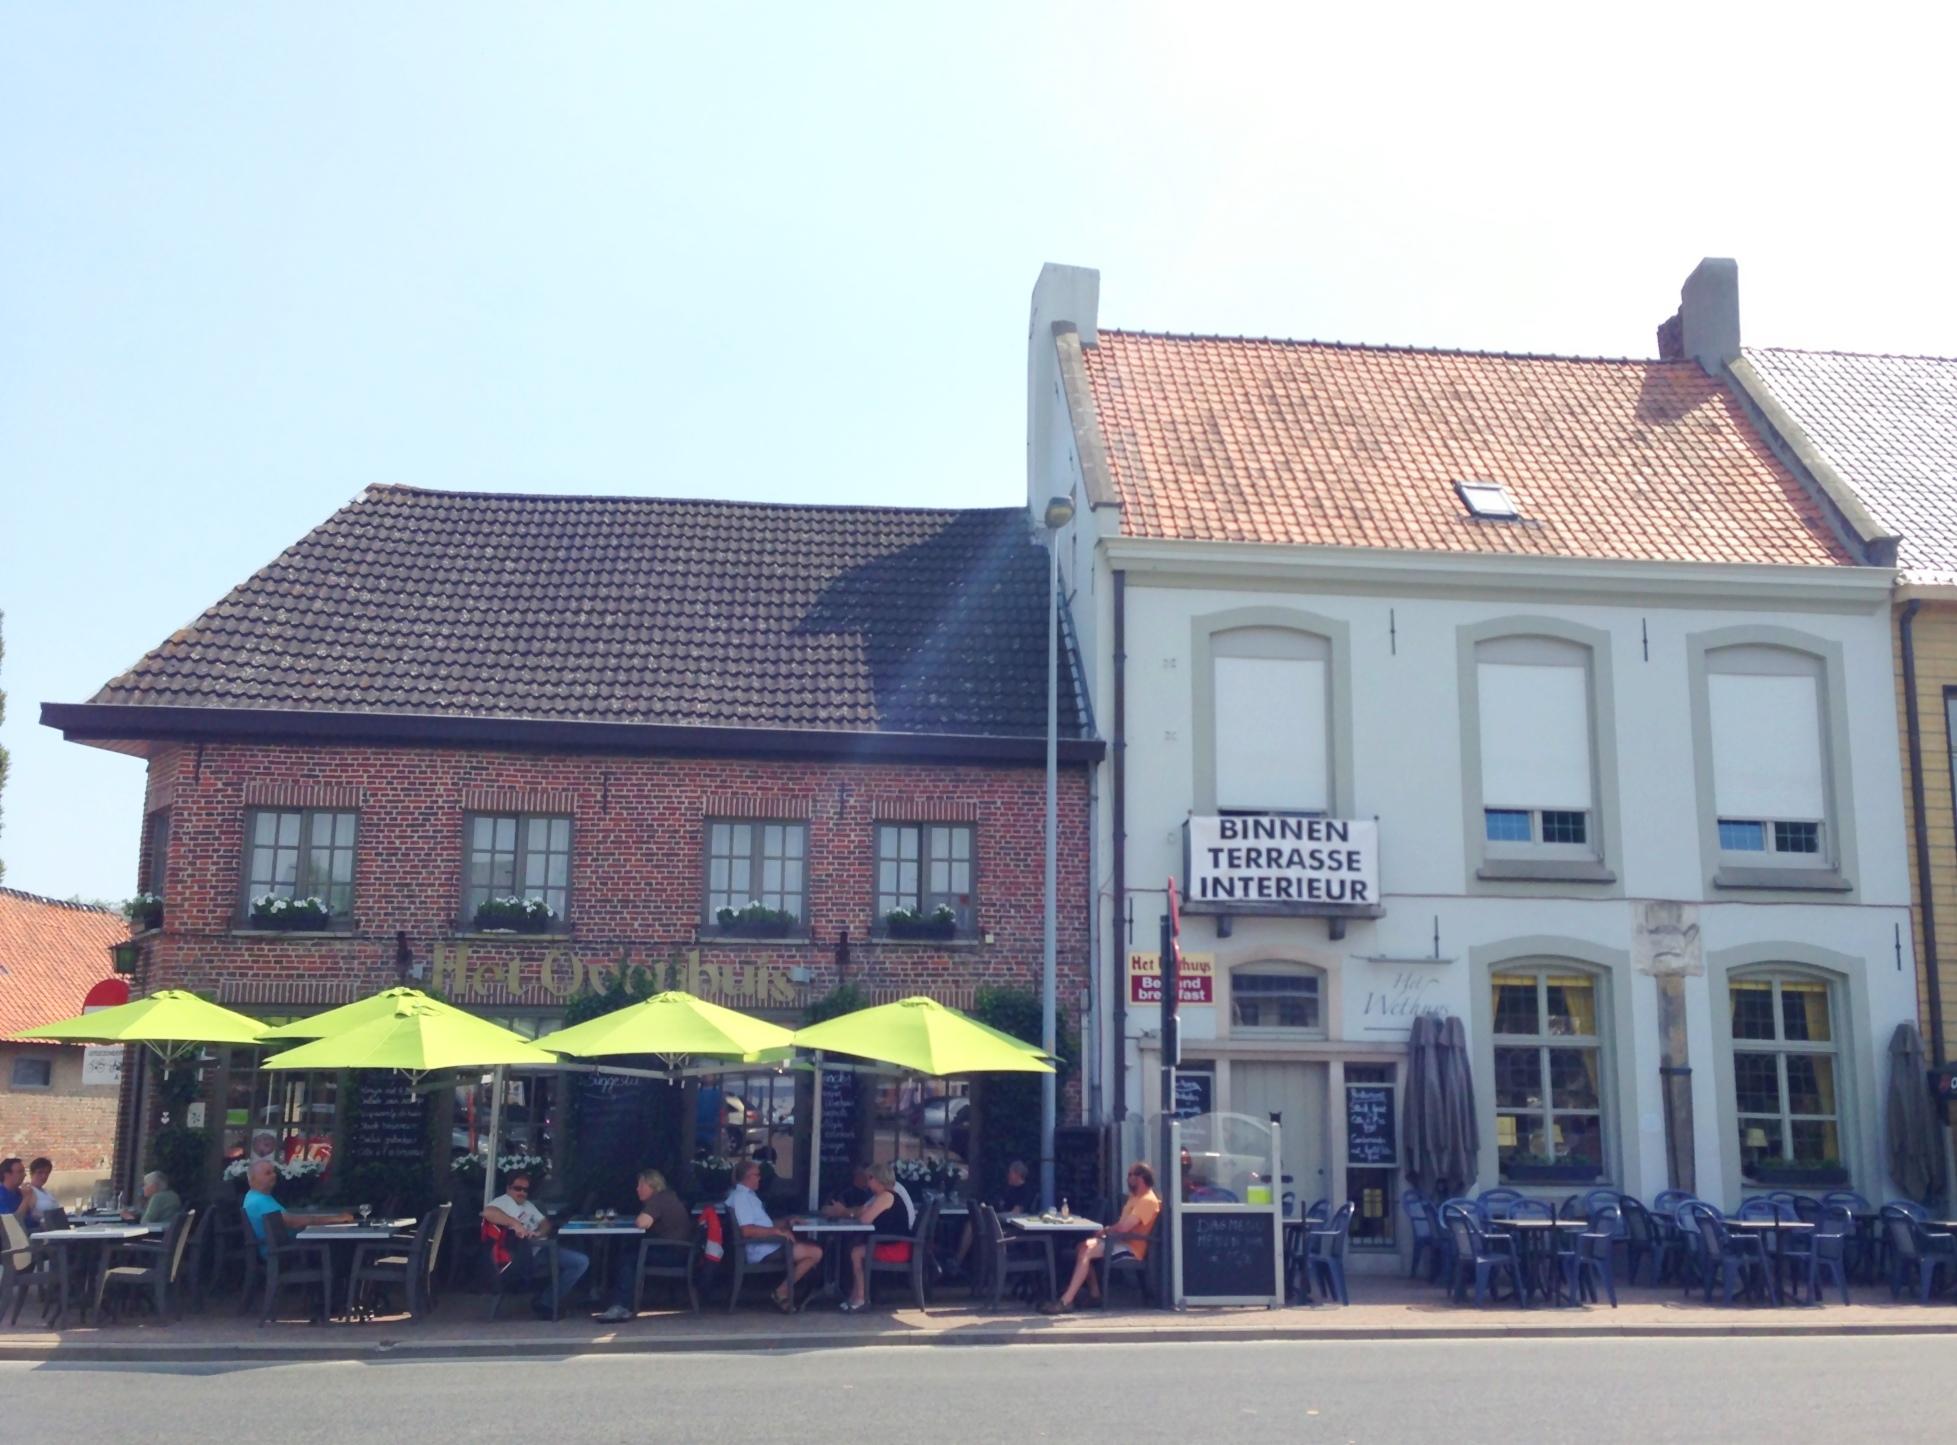 Cafe & inn owned bySt. Bernardus Brewery